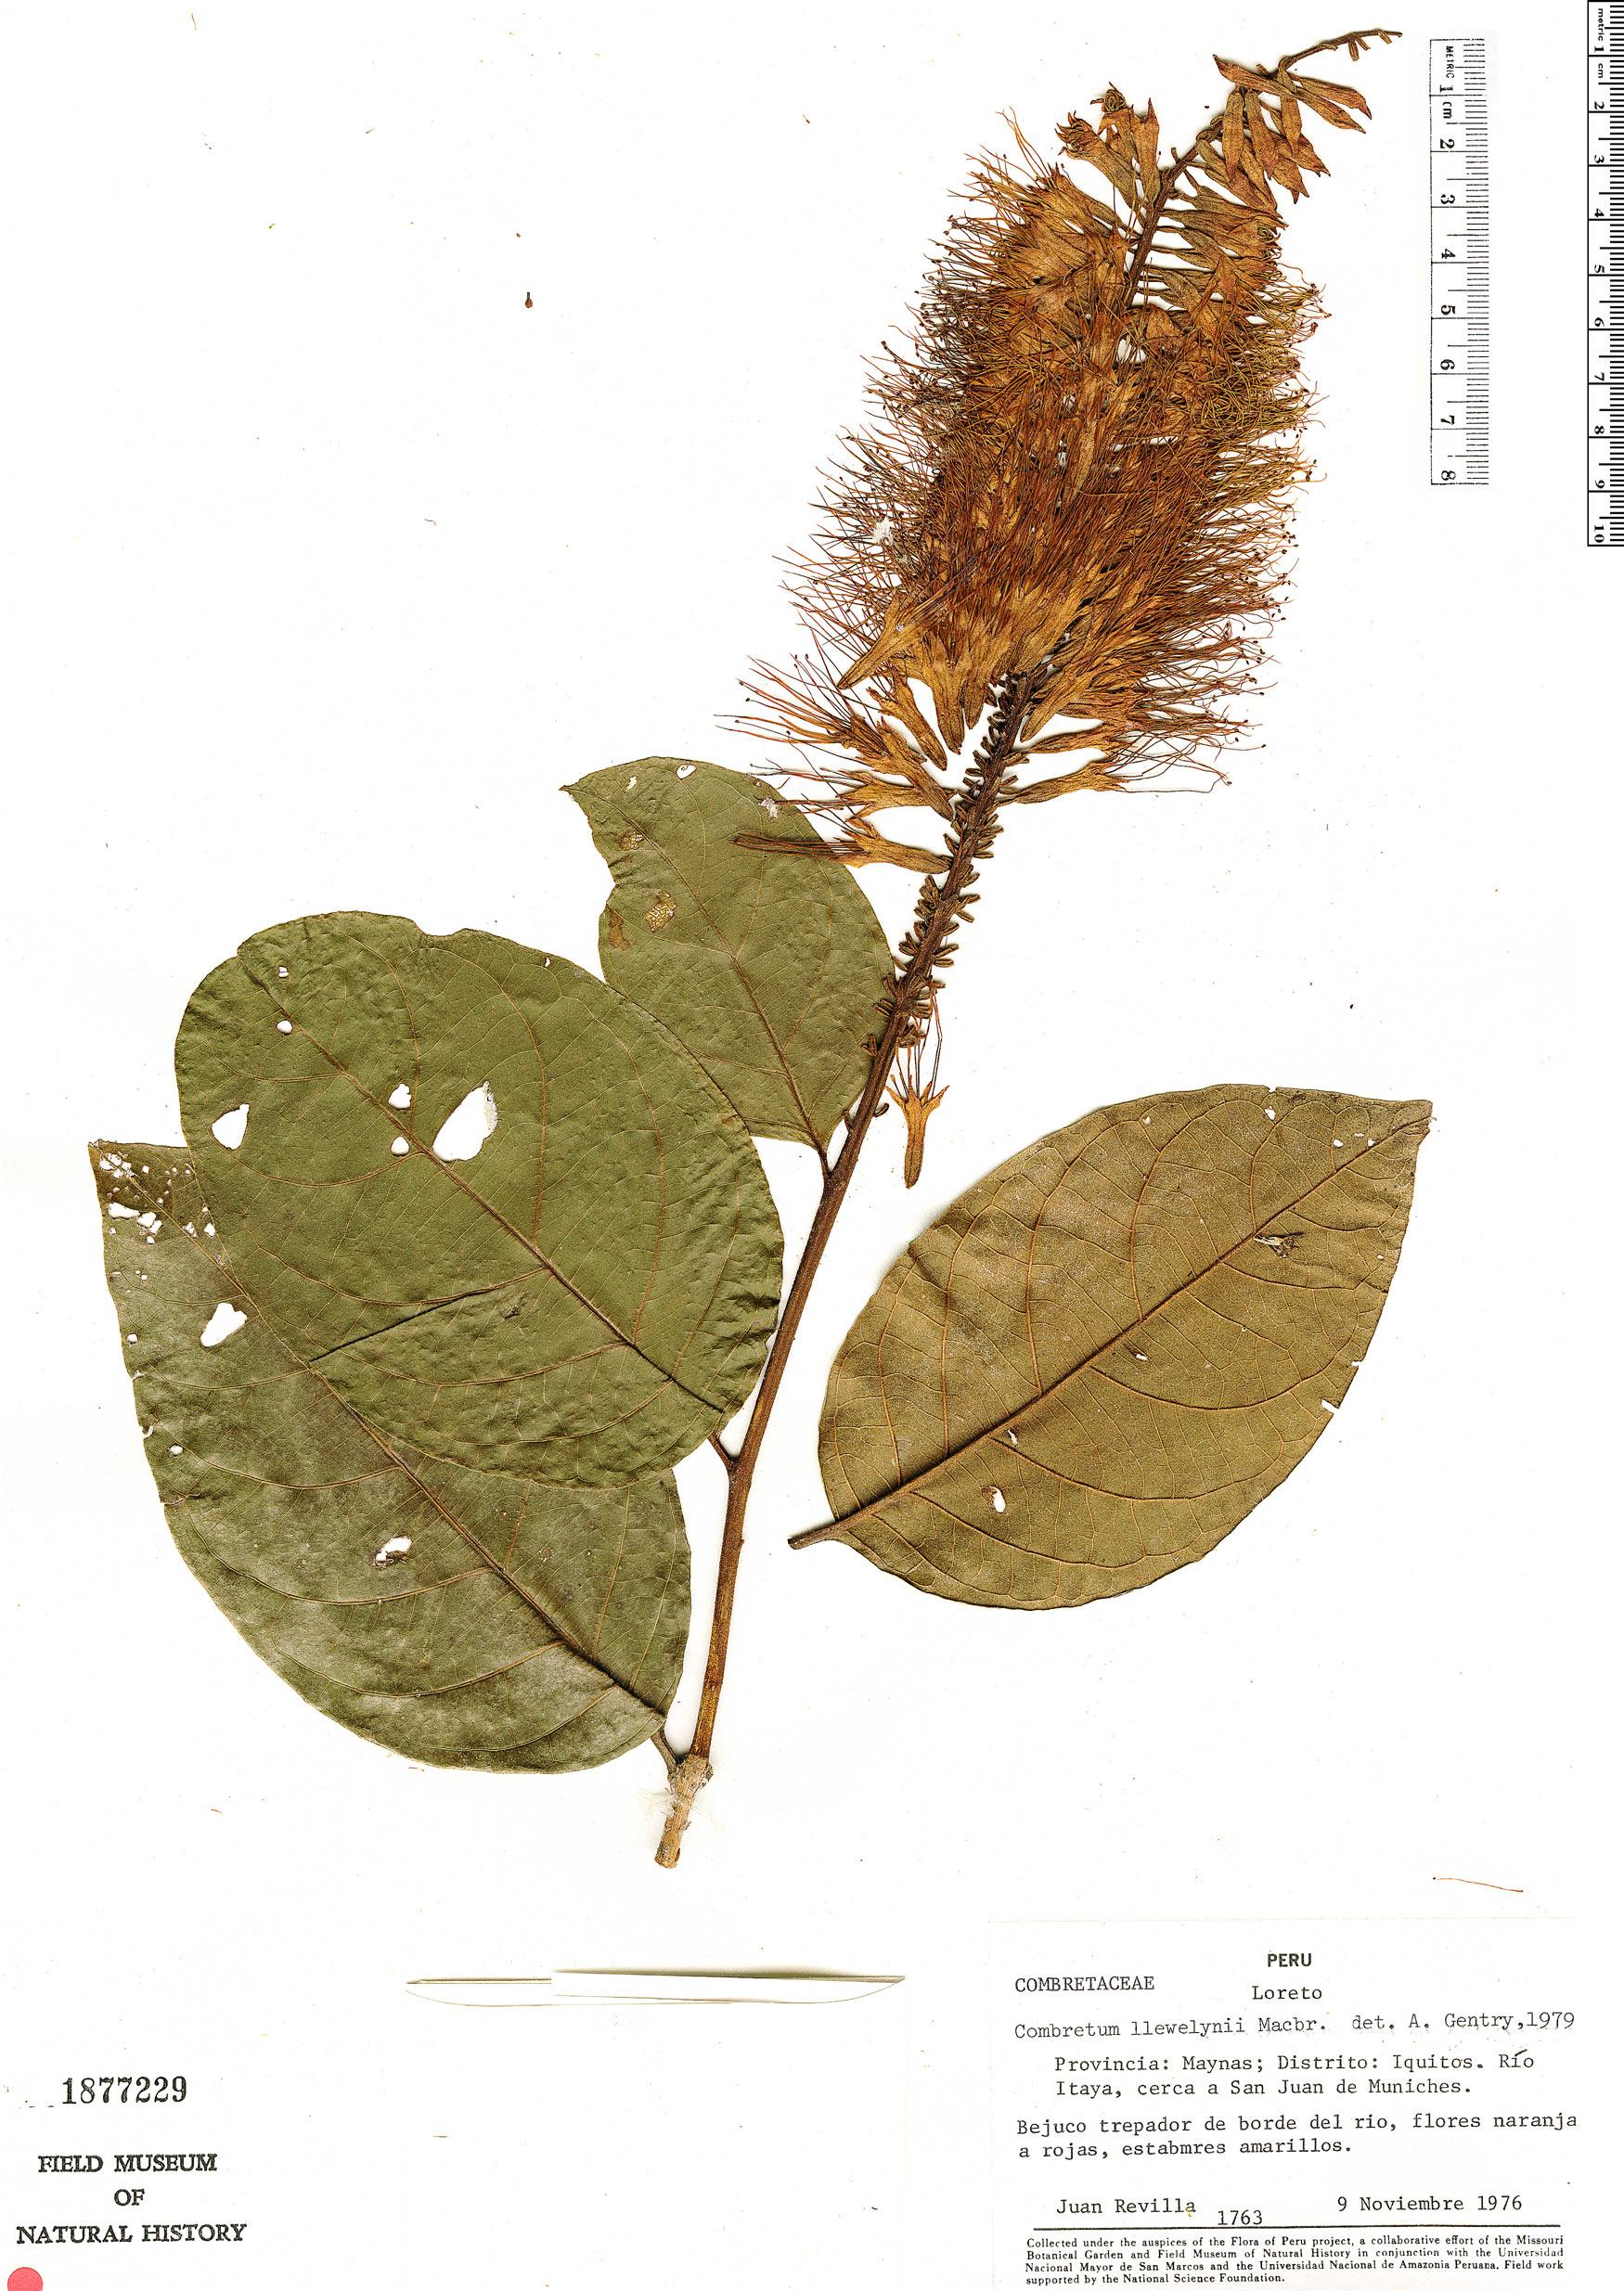 Specimen: Combretum llewelynii